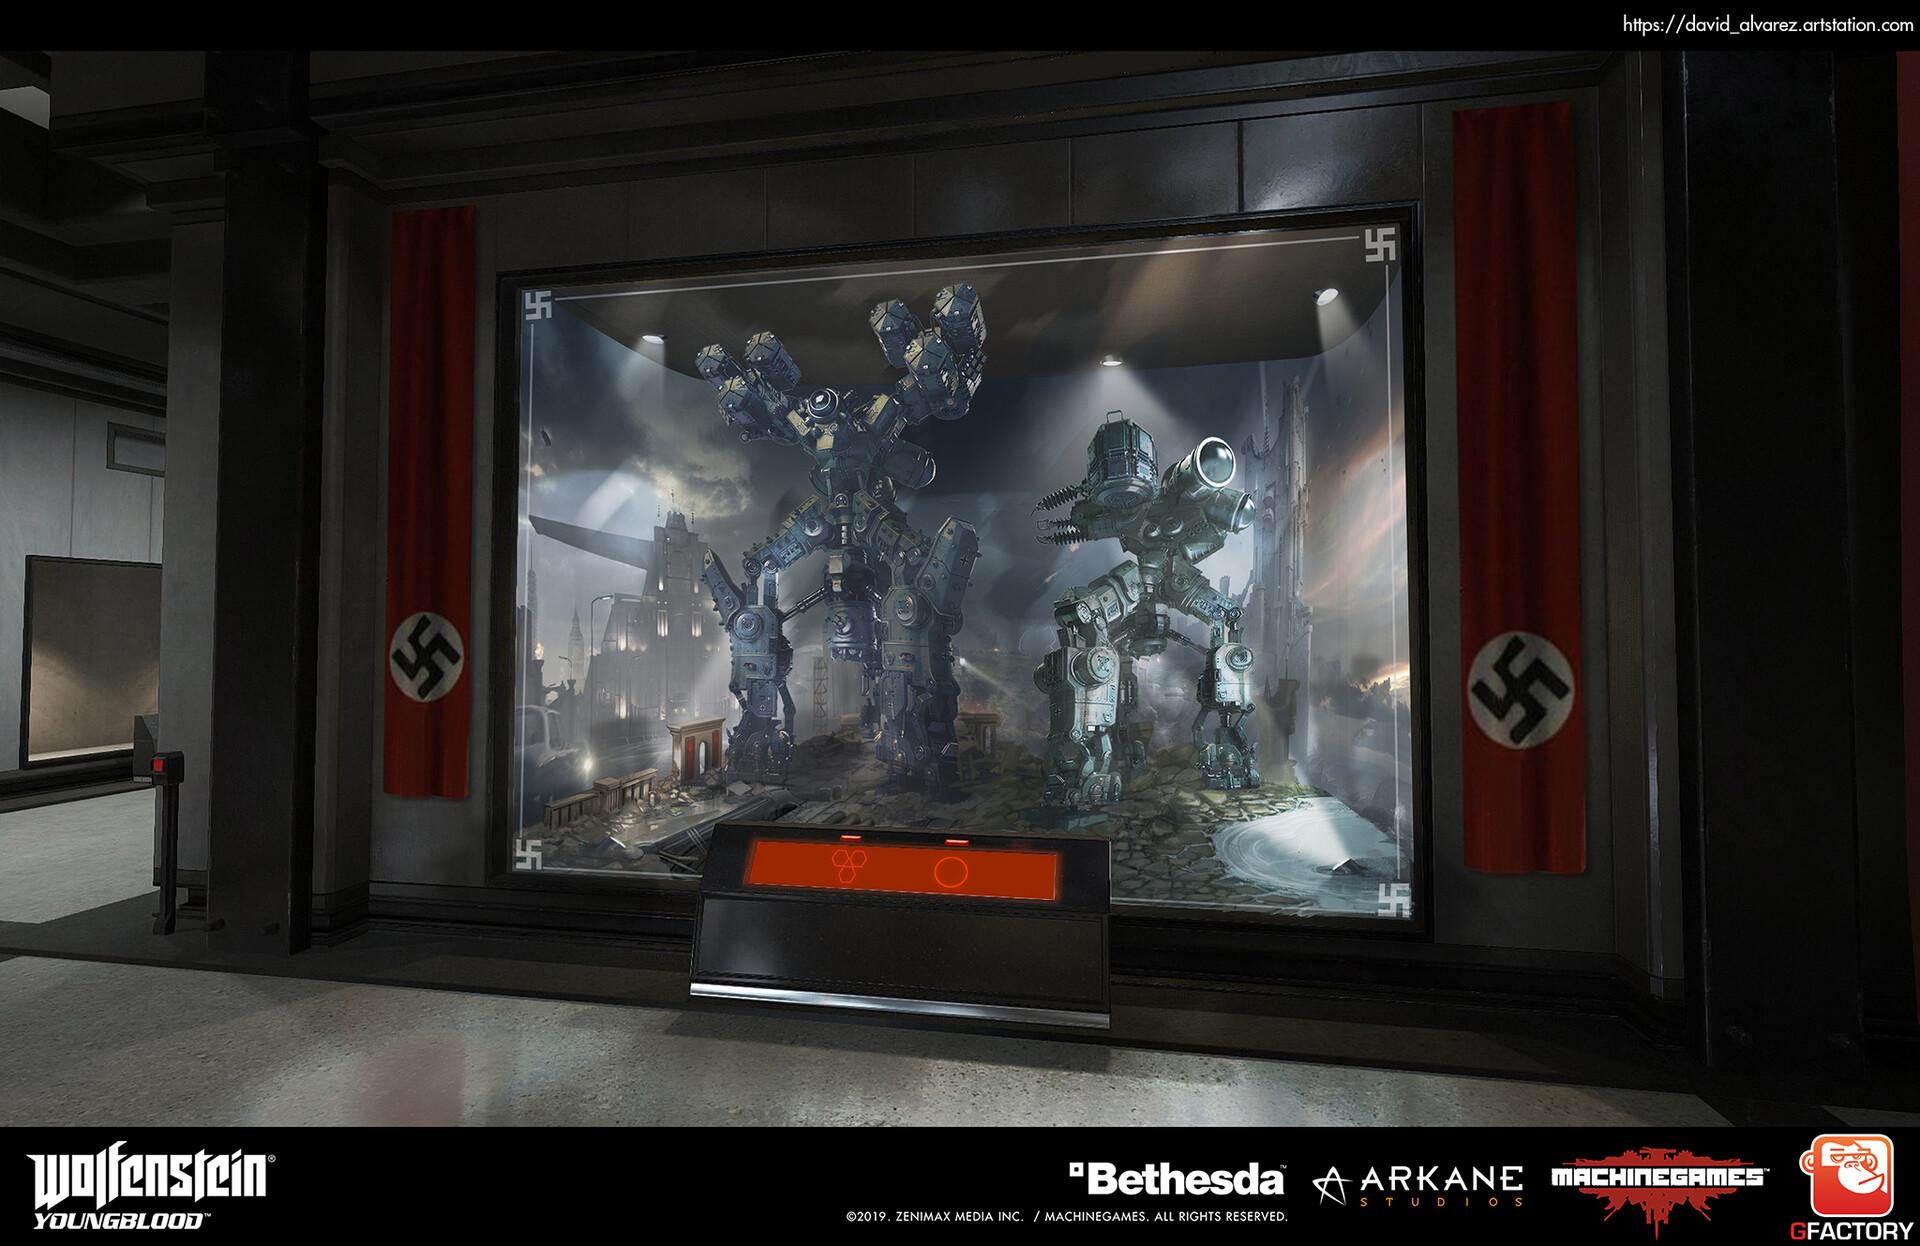 David alvarez dalvarez gf mg yb diorama monitors